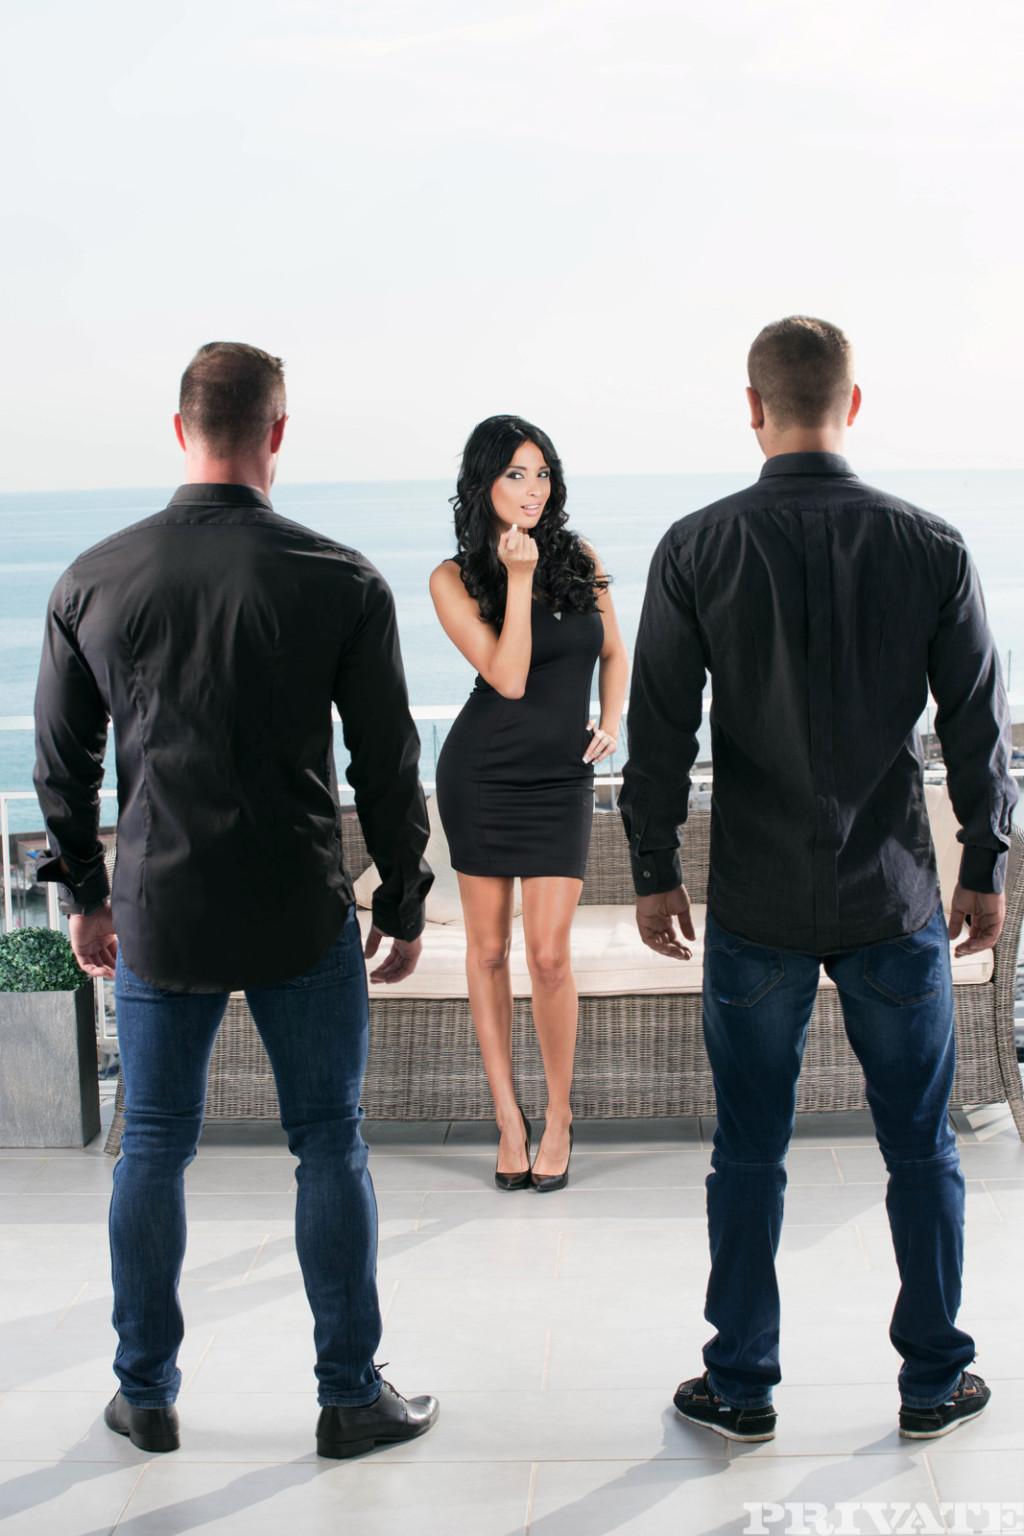 Французская элитная фрау Anissa Kate обслуживает Двух богатых мужчин